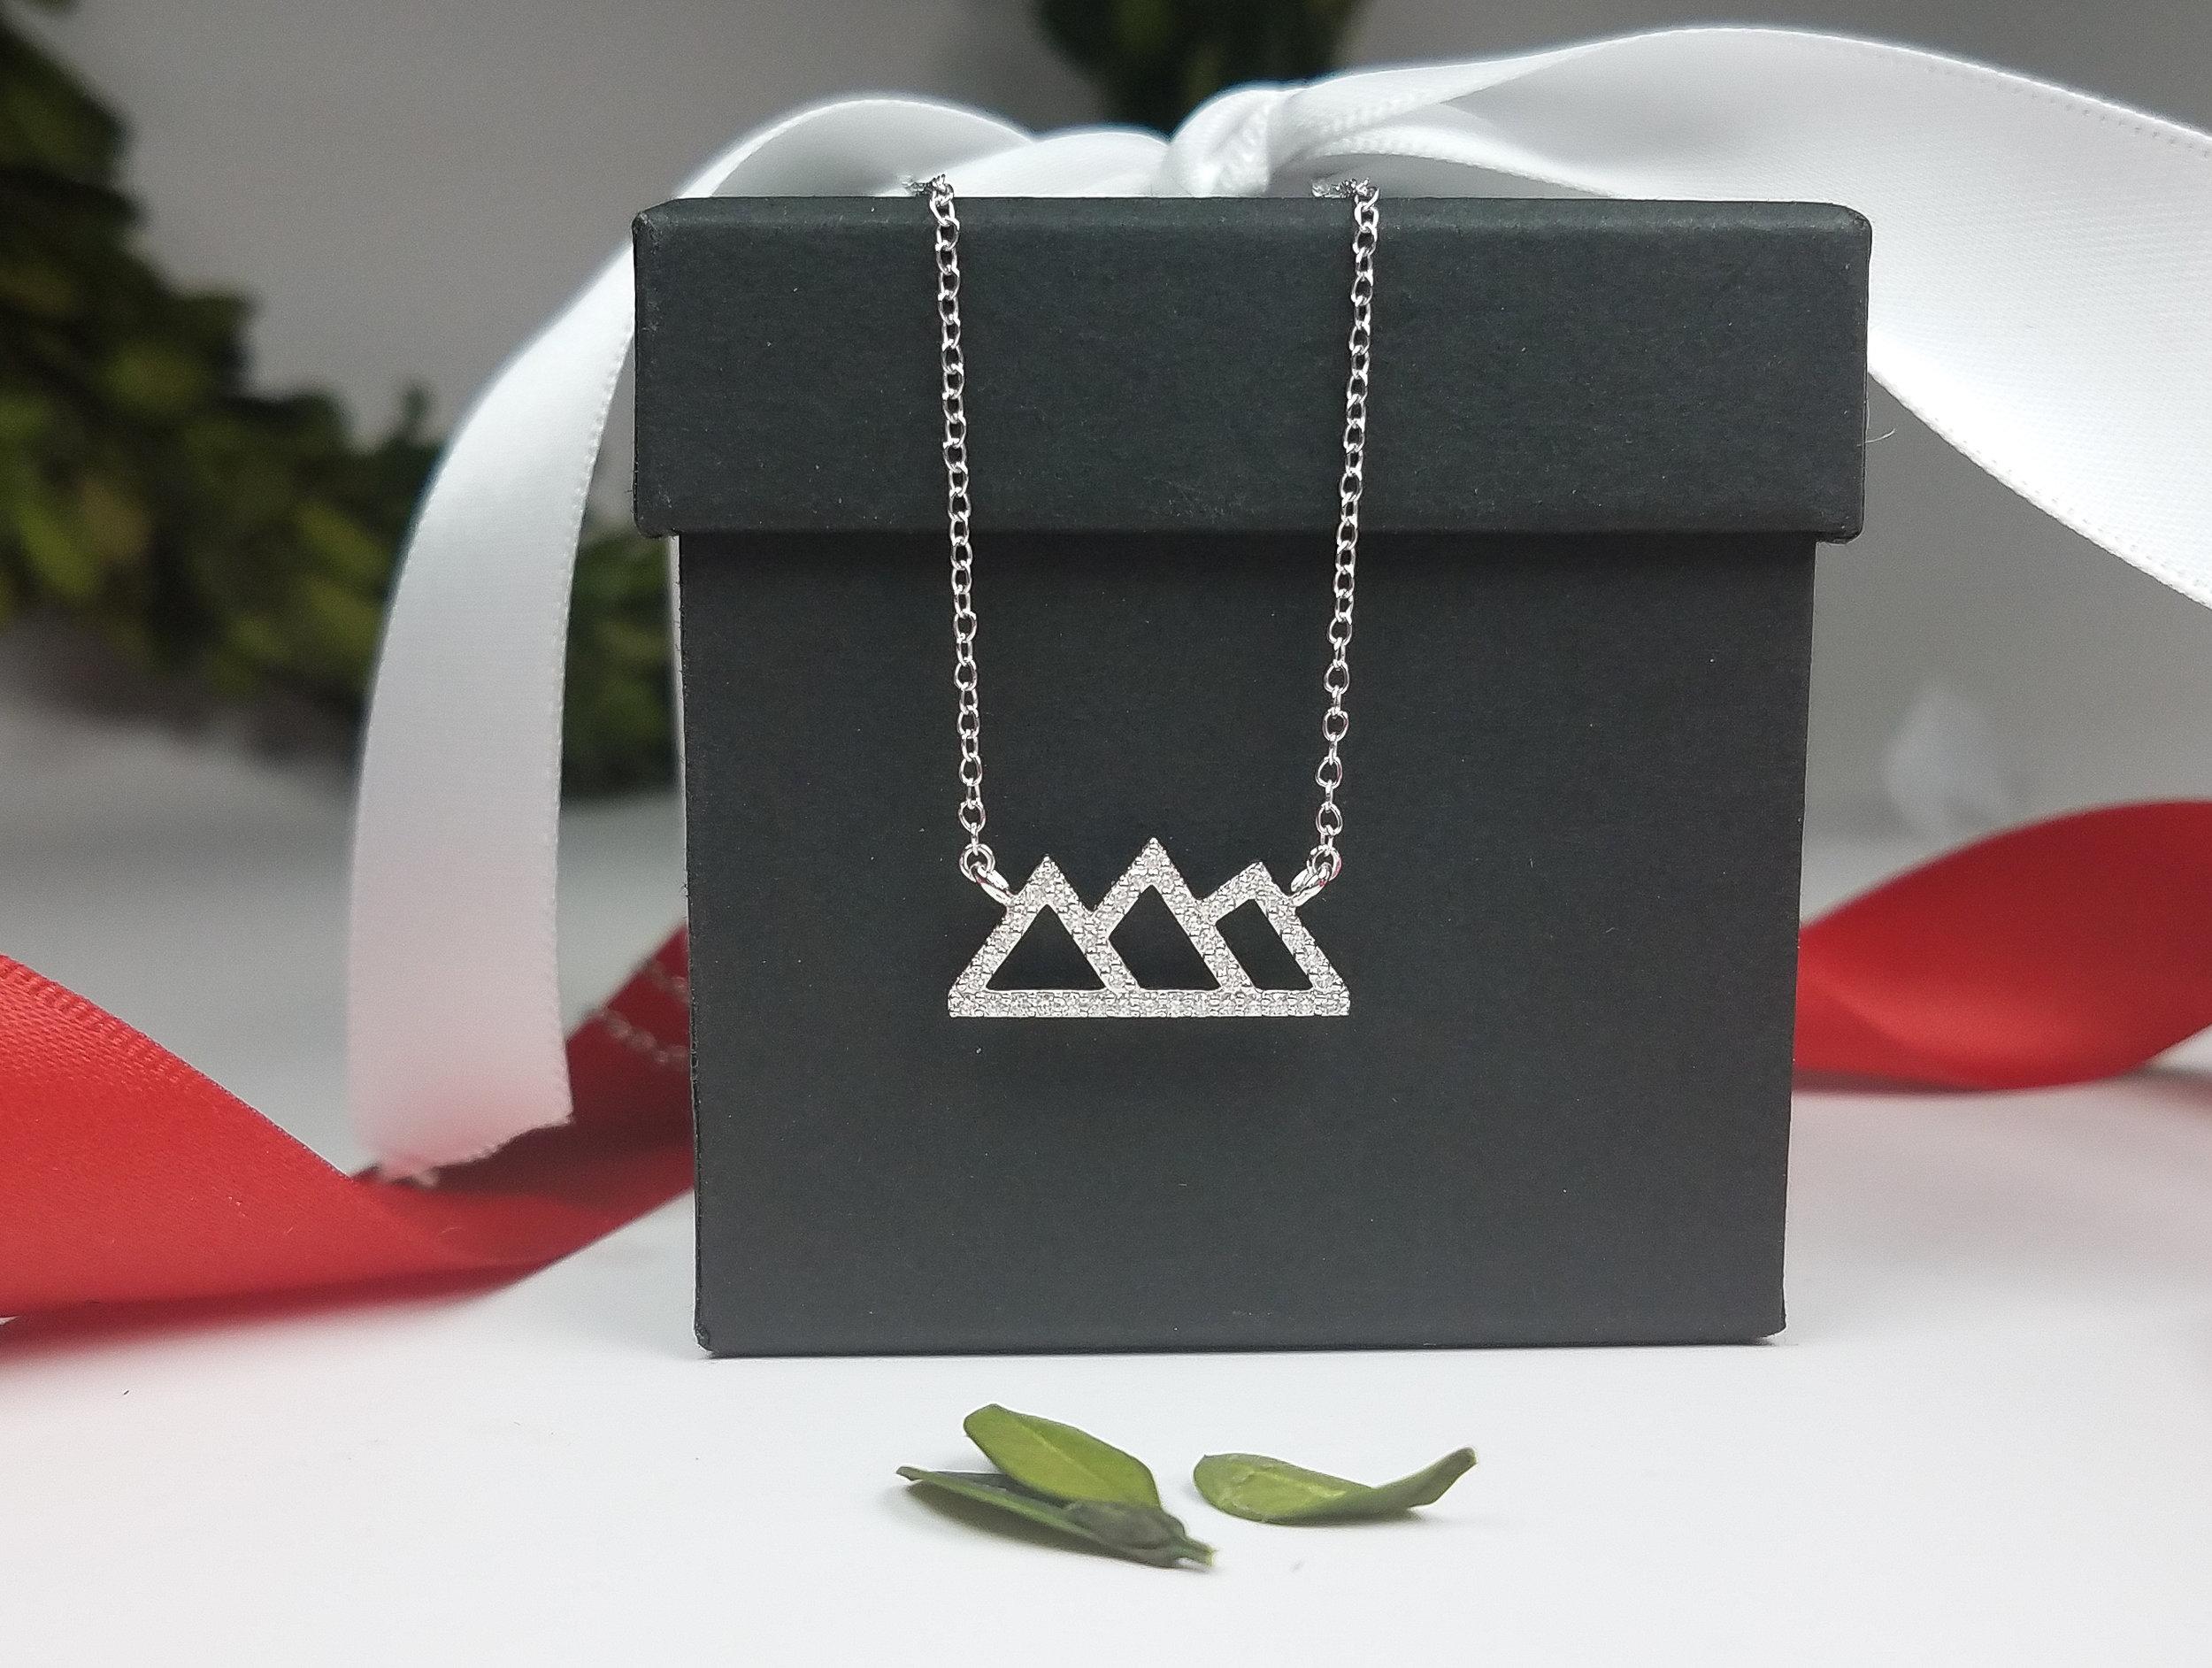 diamond_mountain_necklace_redford_jewelers_holiday_2018.jpeg